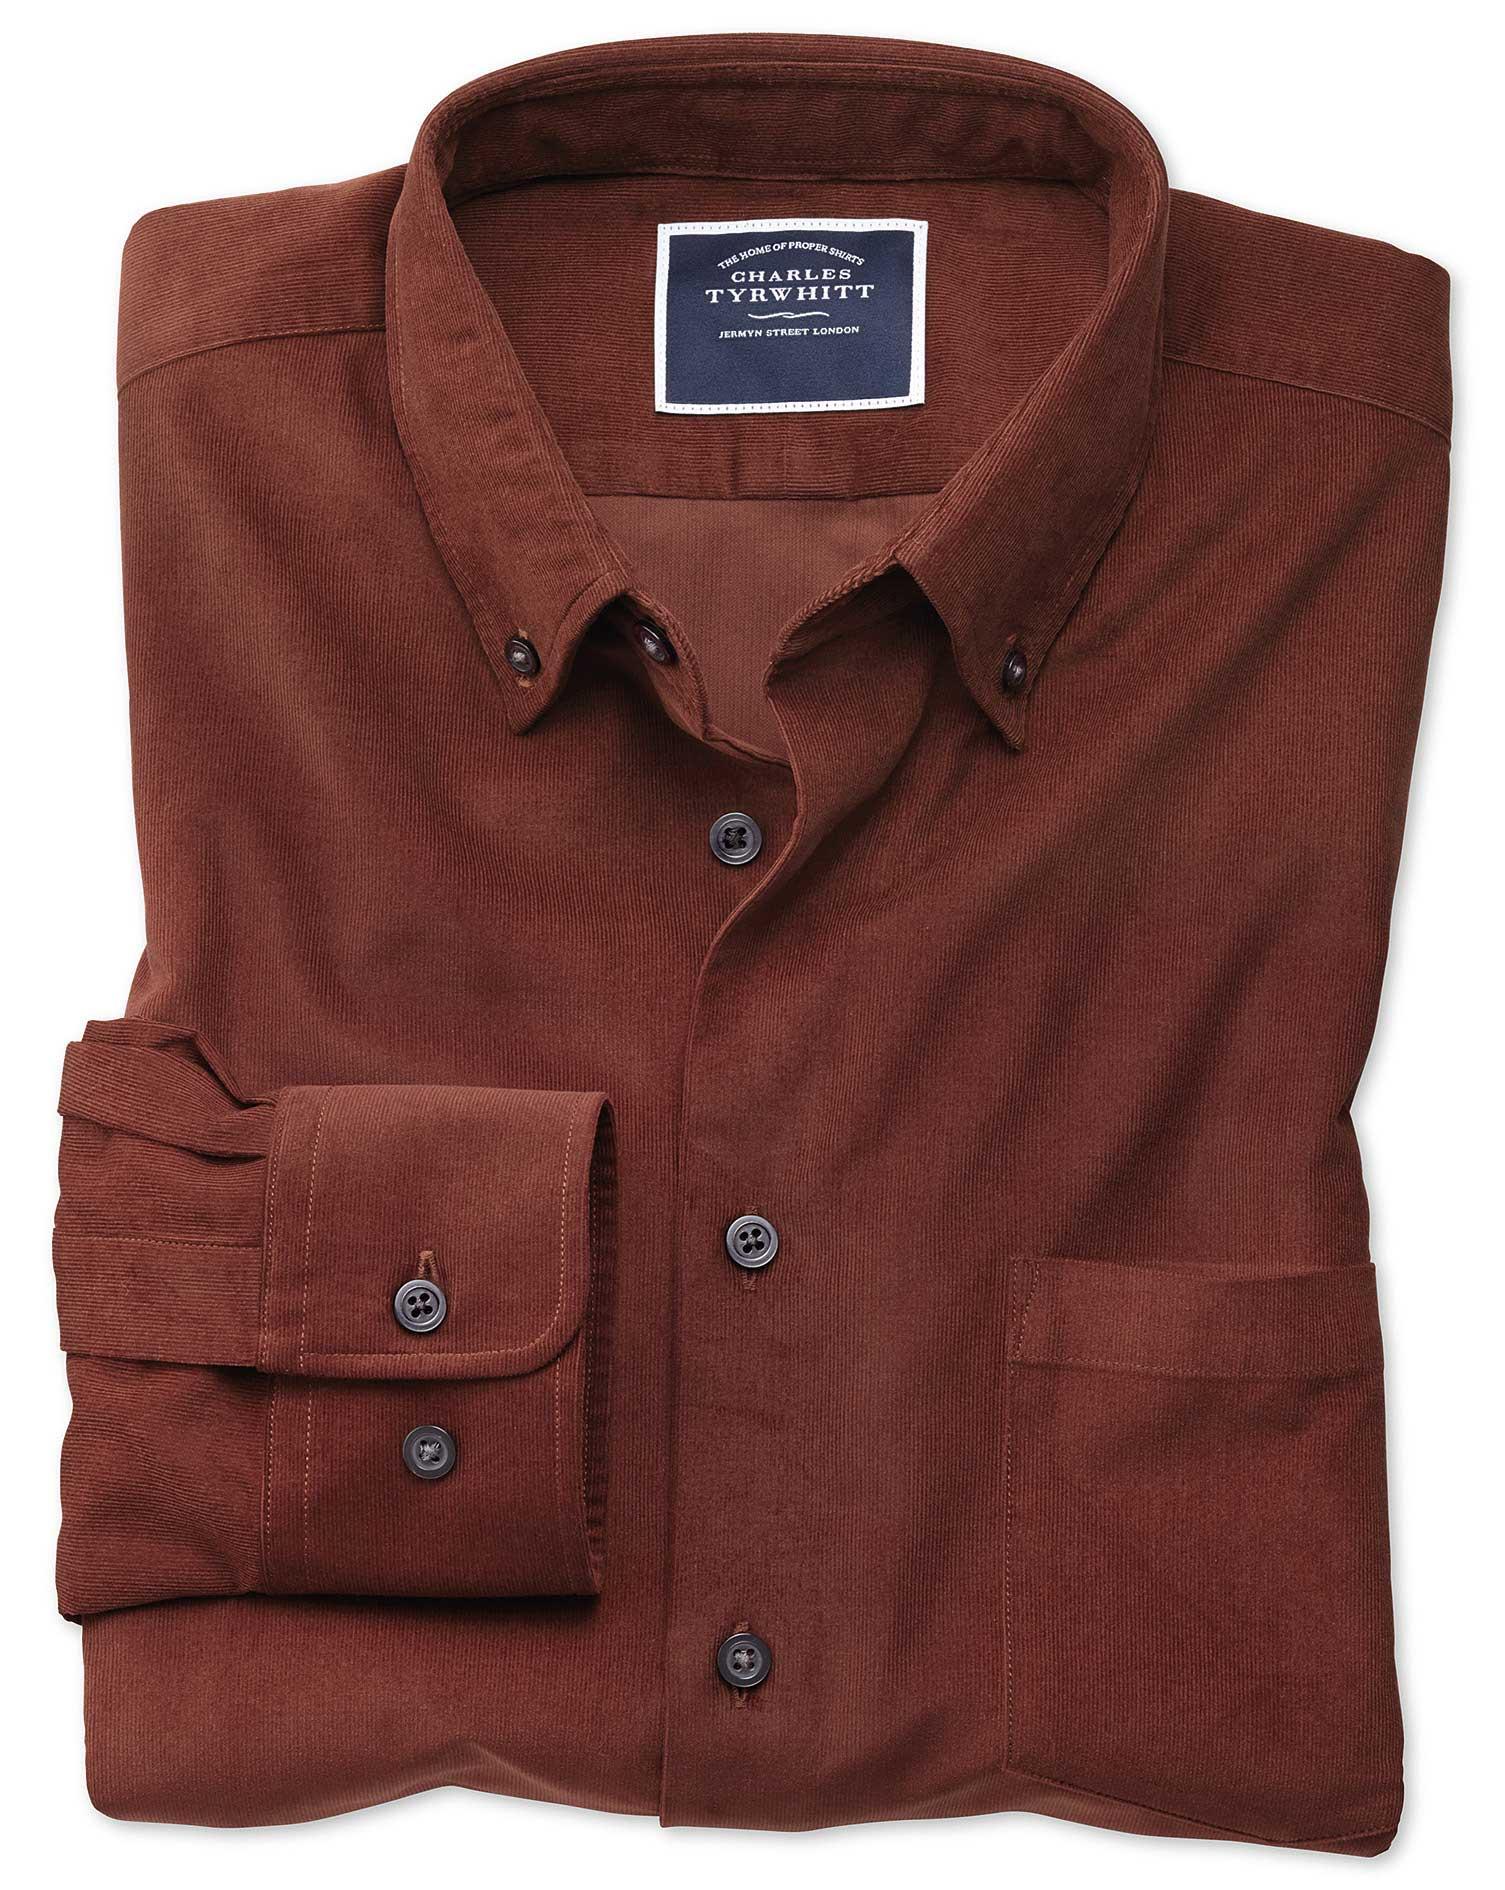 Classic Fit Plain Rust Fine Corduroy Cotton Shirt Single Cuff Size Medium by Charles Tyrwhitt